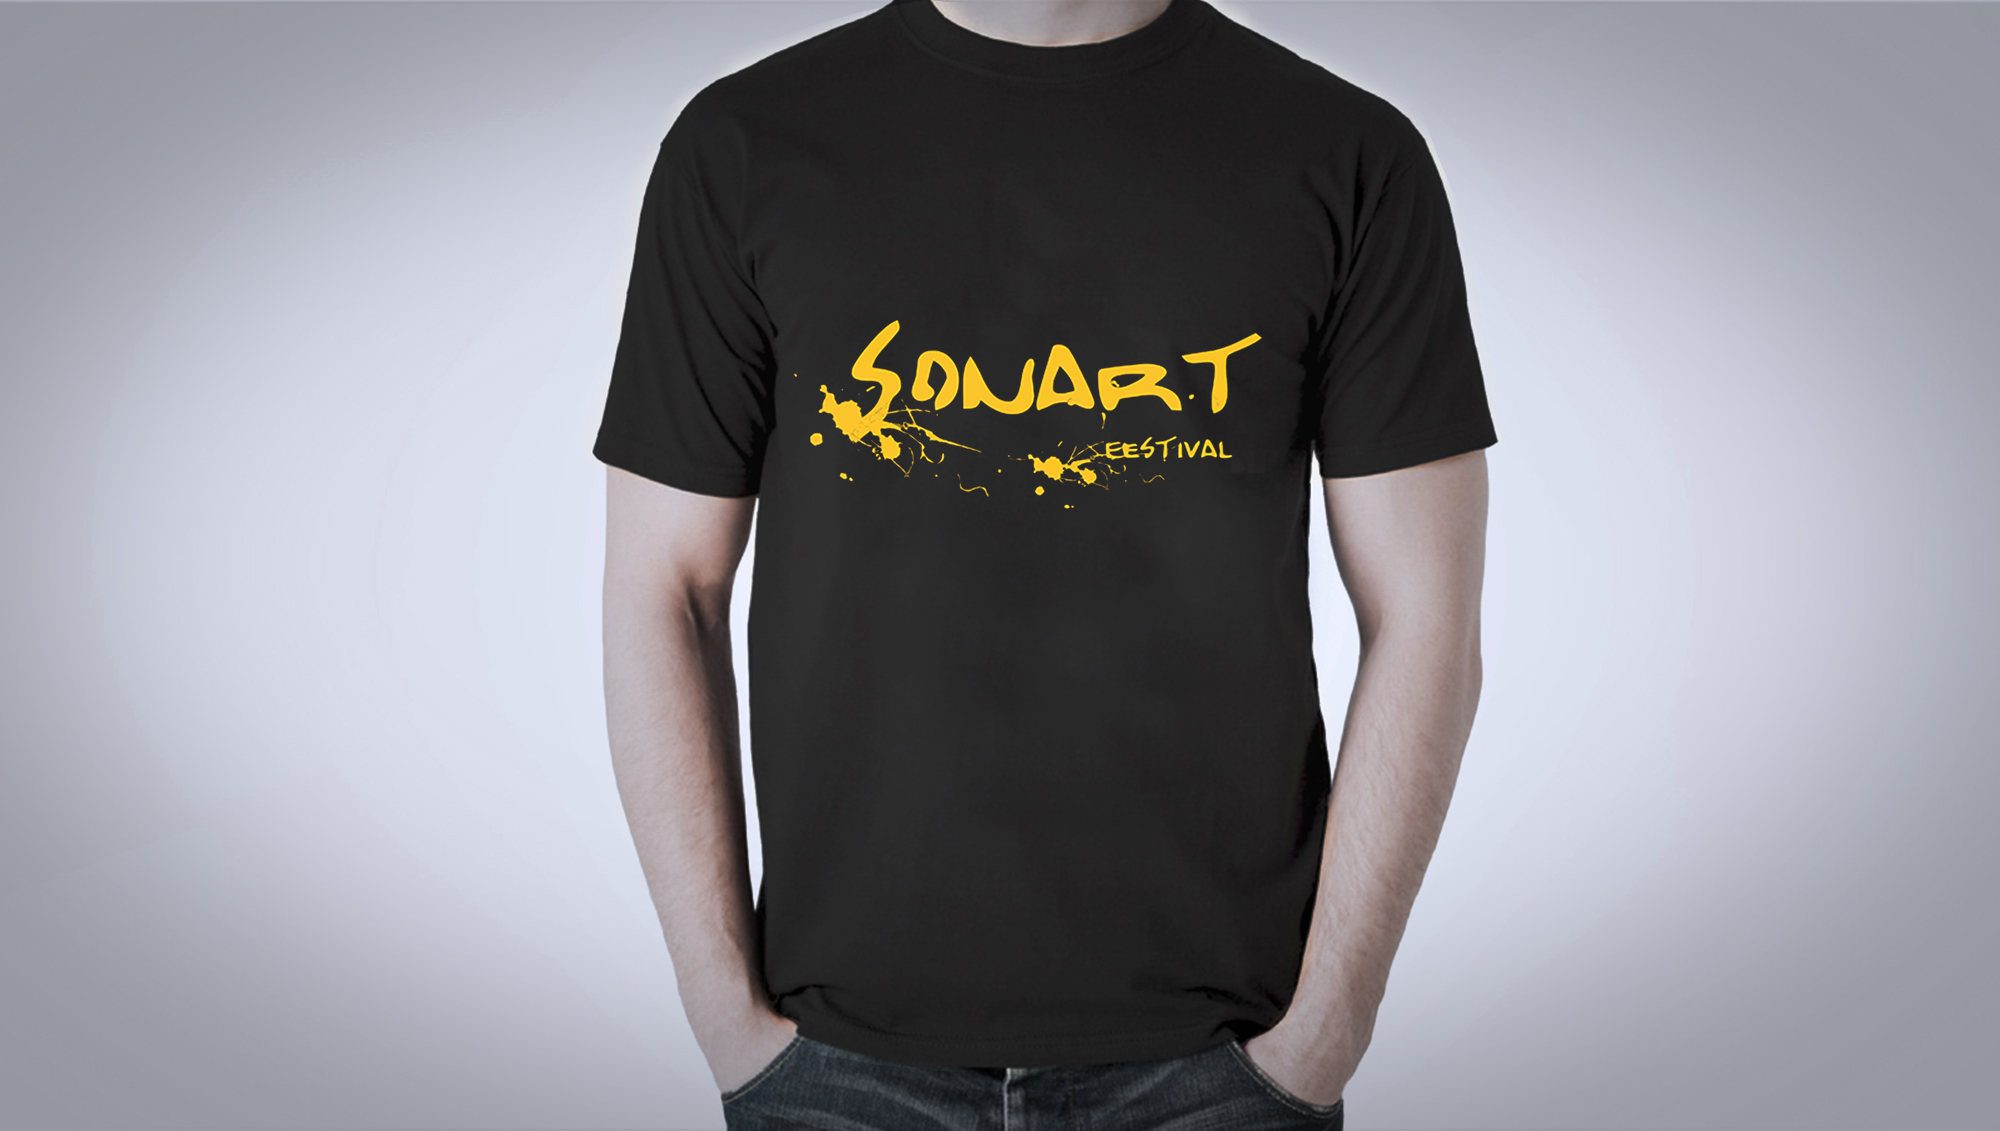 sonart04